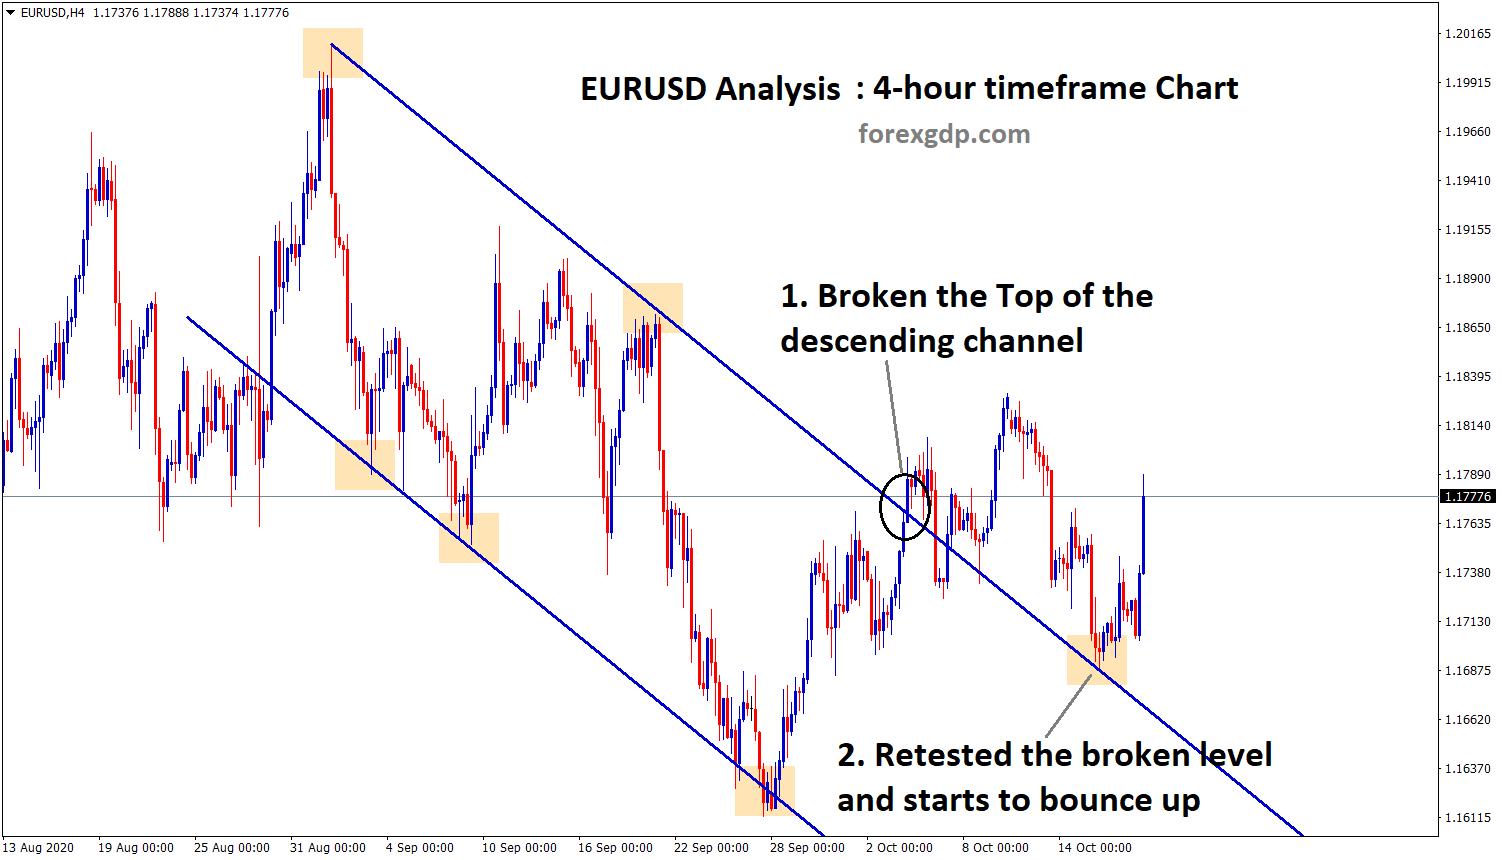 eurusd broken descending channel and bouncing up